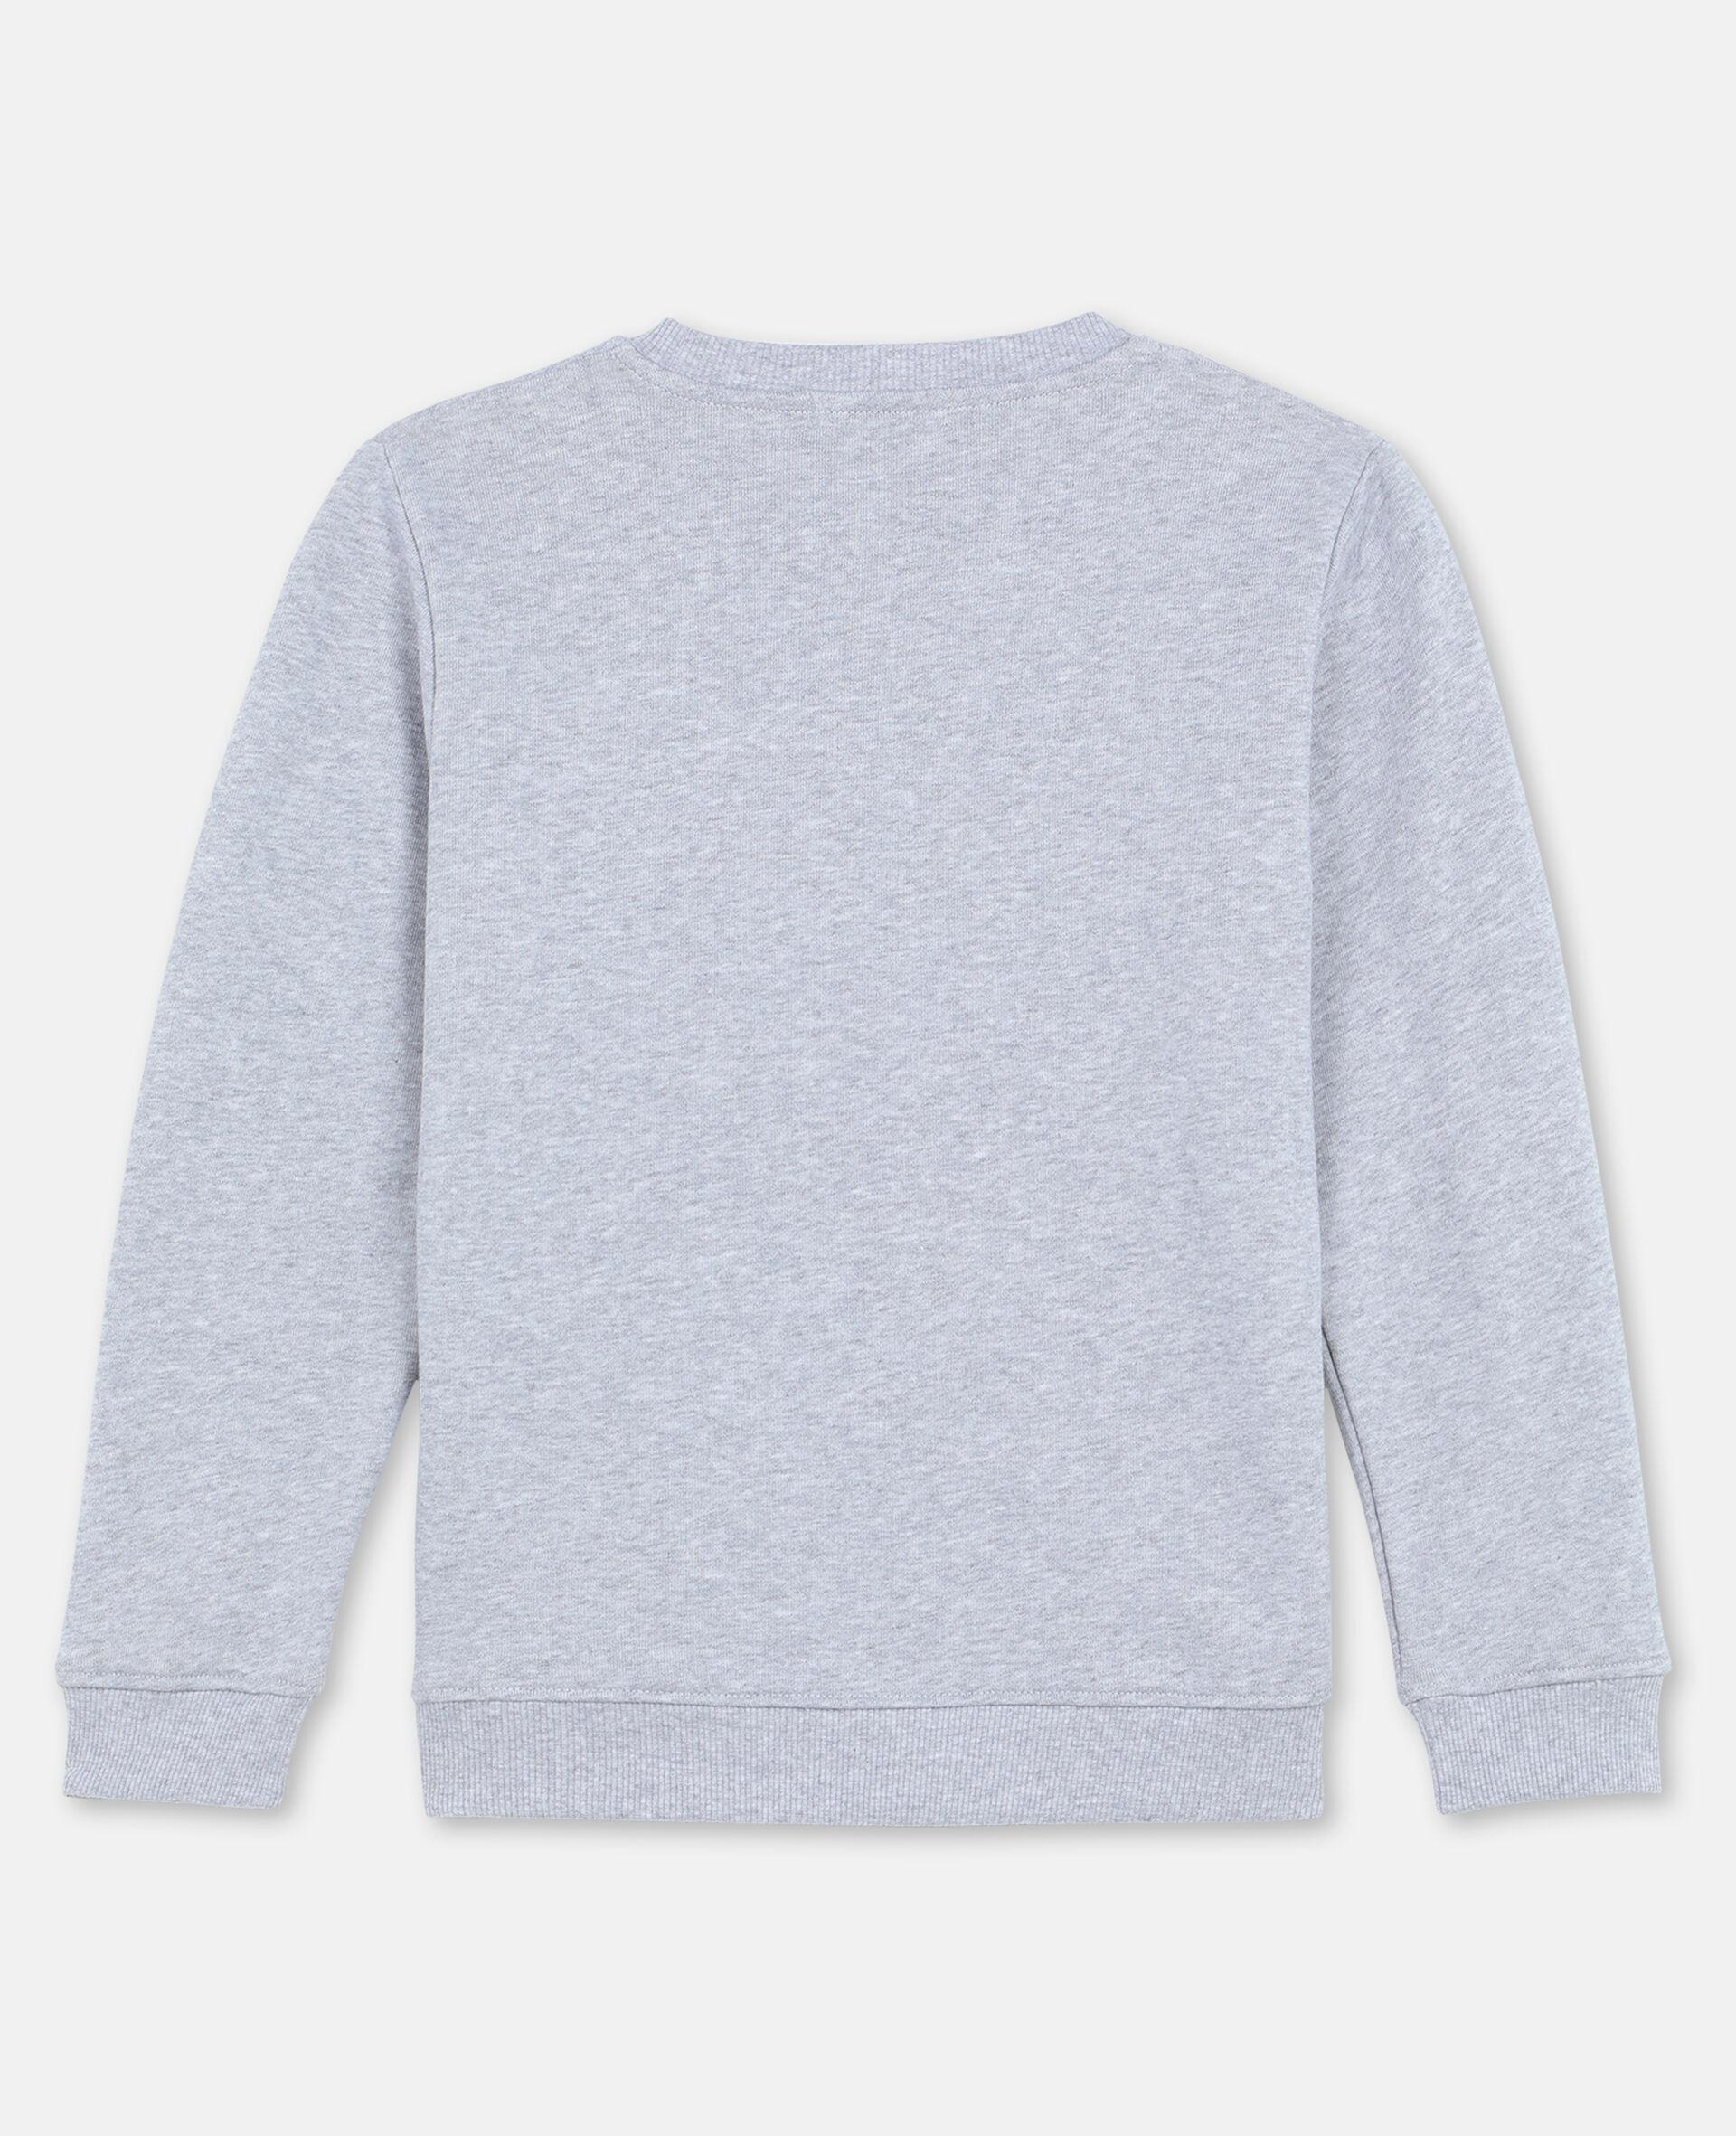 Roarrr Cotton Sweatshirt -Grey-large image number 3